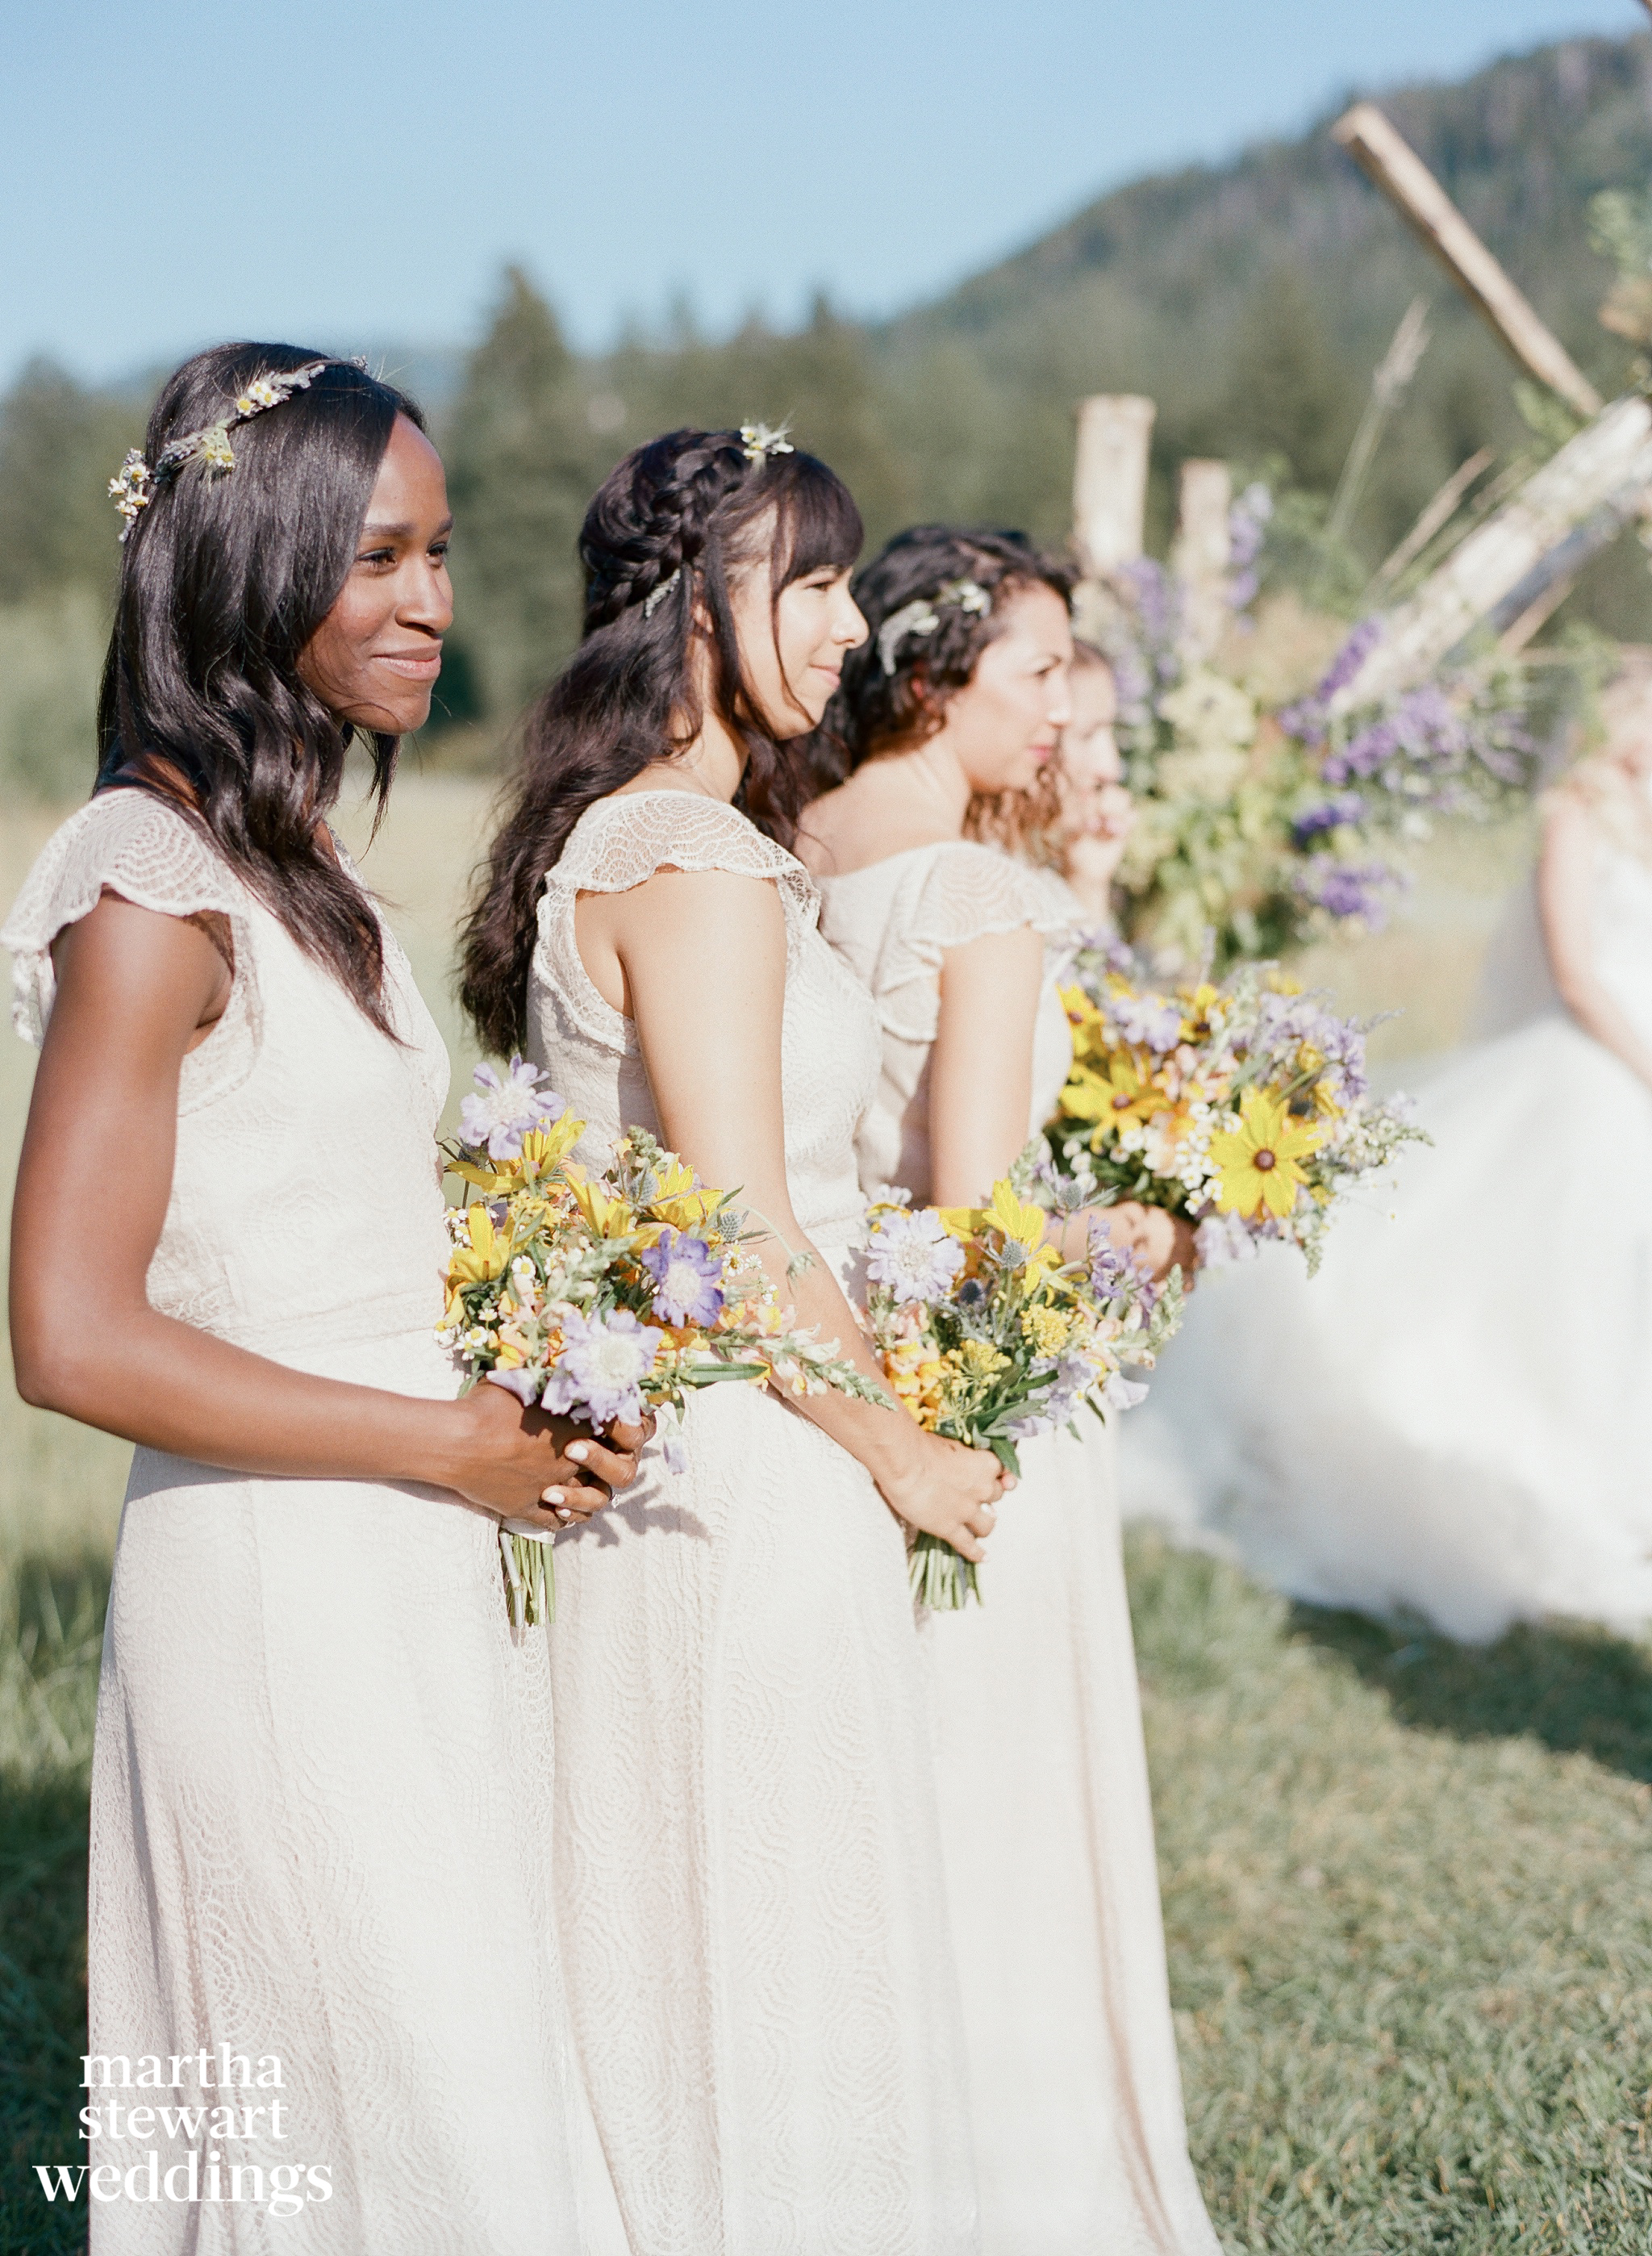 beth behrs michael gladis wedding ceremony bridesmaids sylvie gil